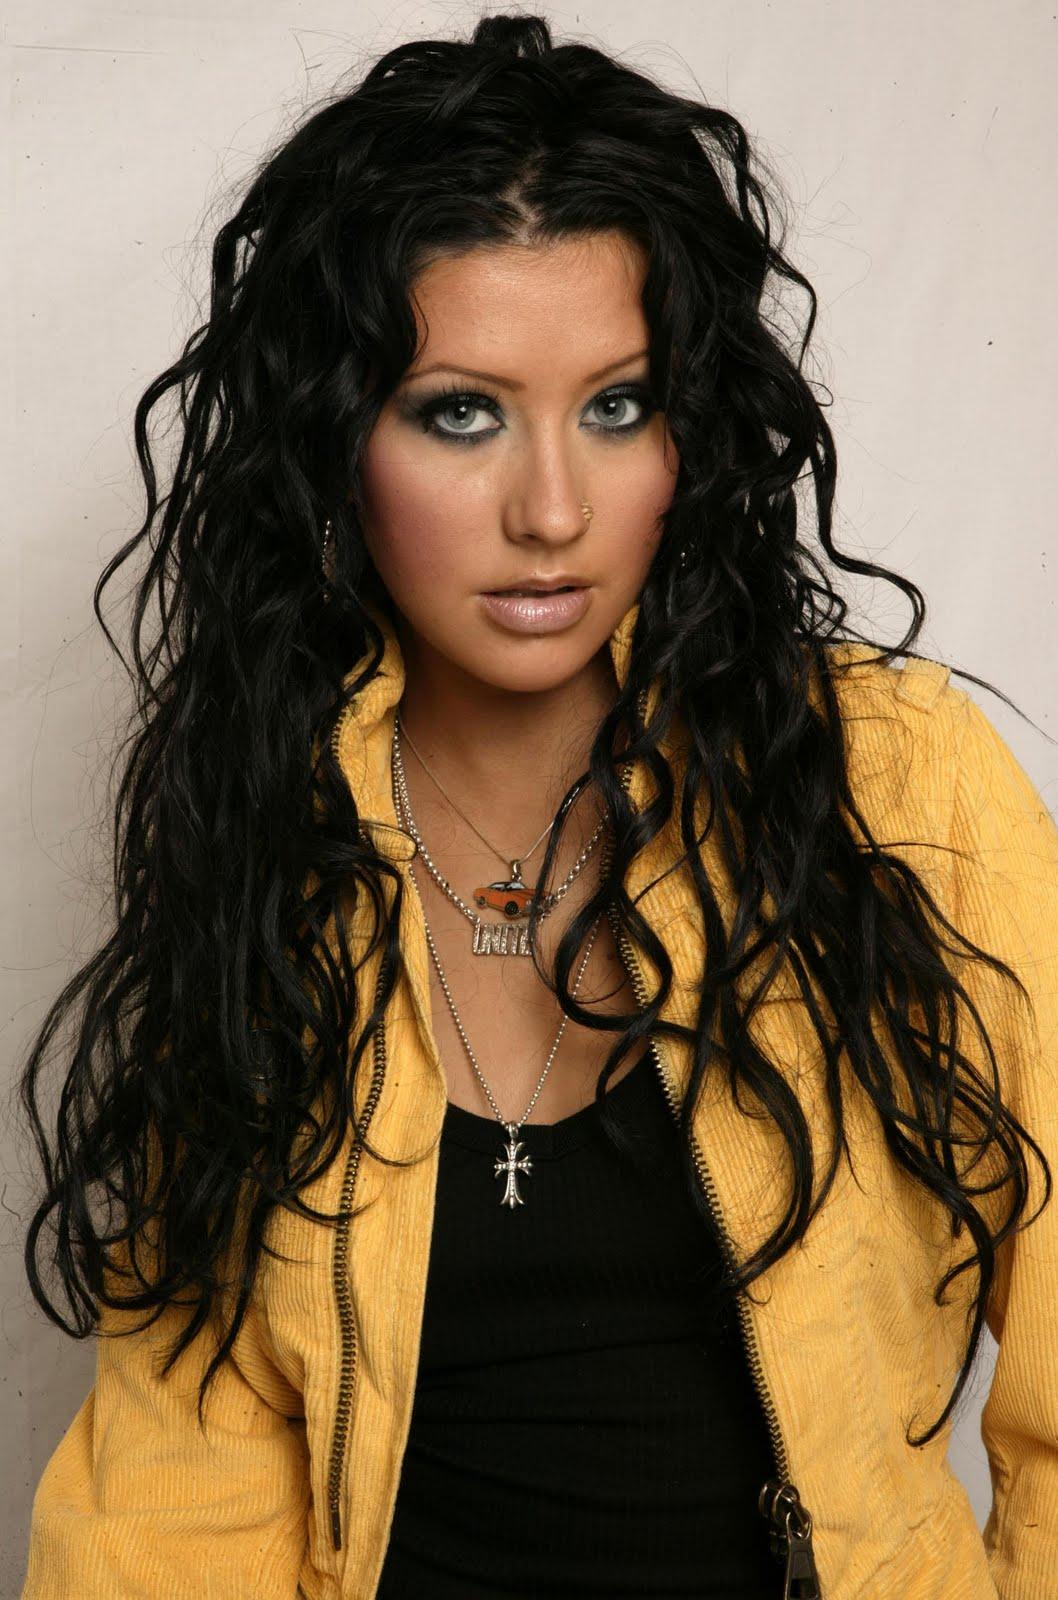 Fausto Xavier Aguilera >> Most Desirable Celebrities: 19-Nov-2011